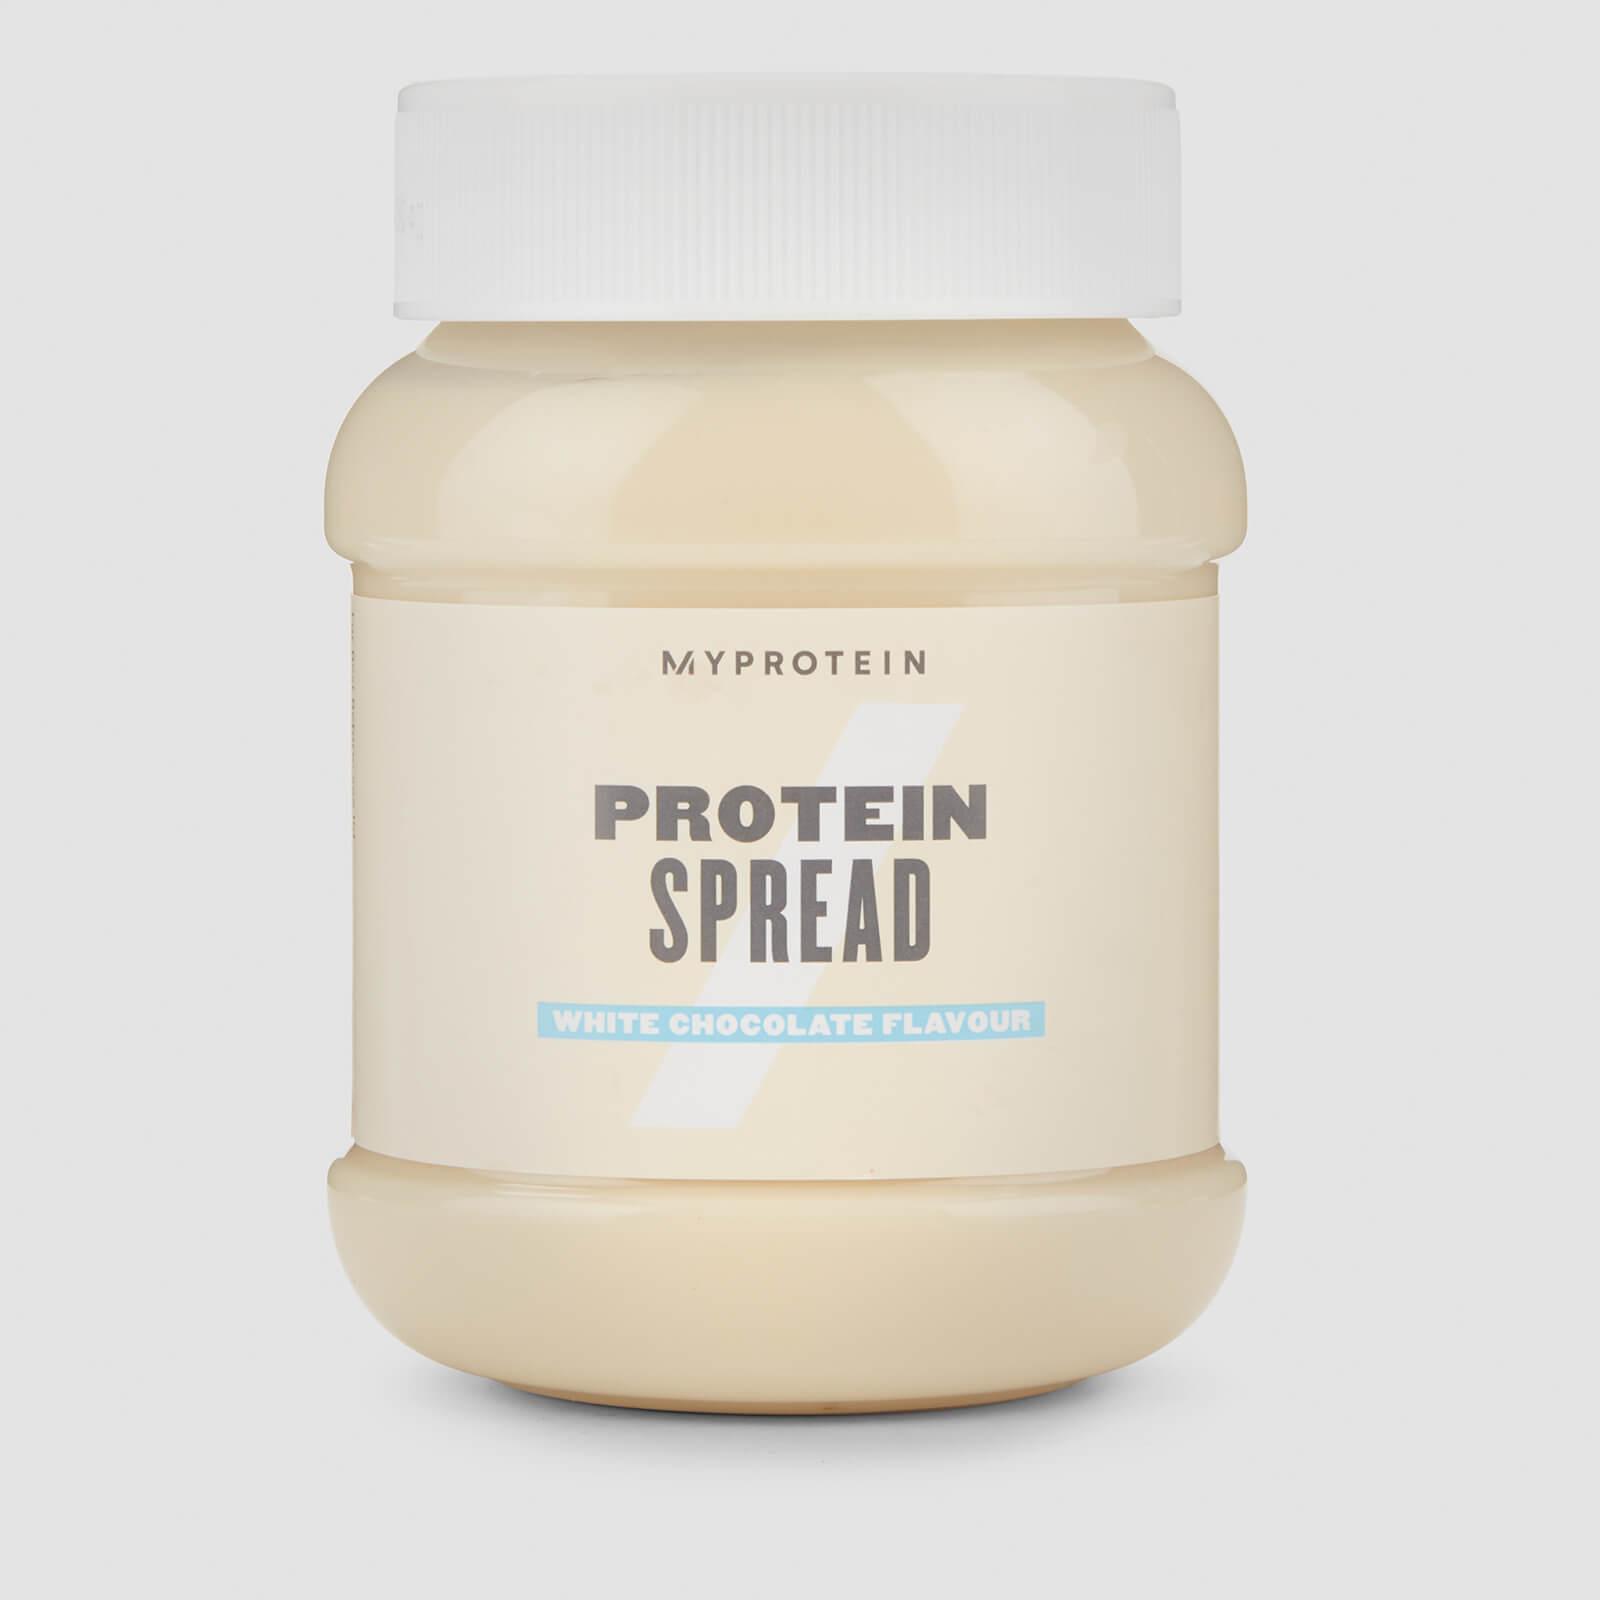 Myprotein Pâte à tartiner protéinée - 360g - Chocolat blanc